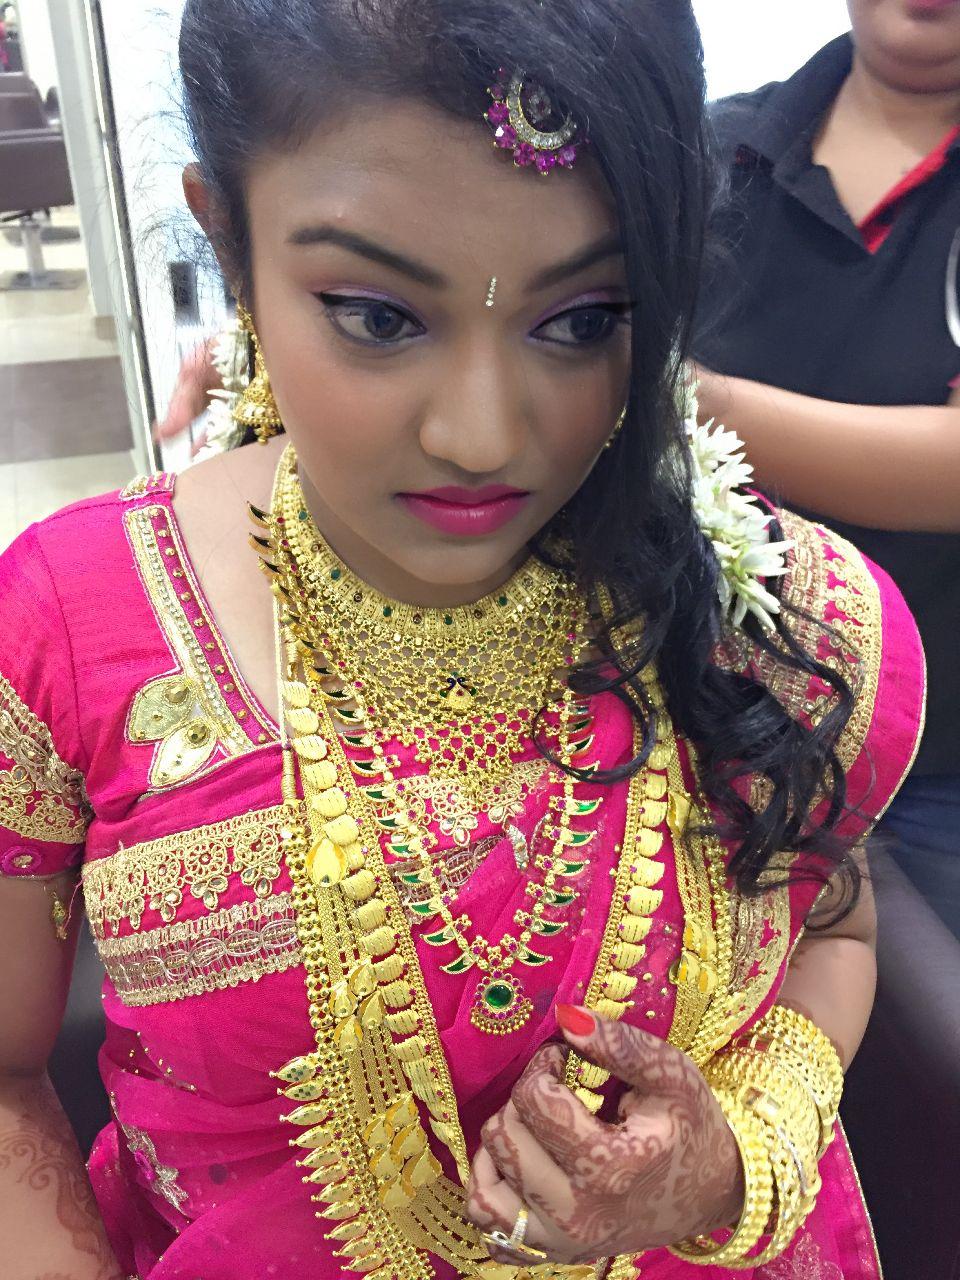 Indian Wedding Indian Bride South Indian Bride Bridal Make Up